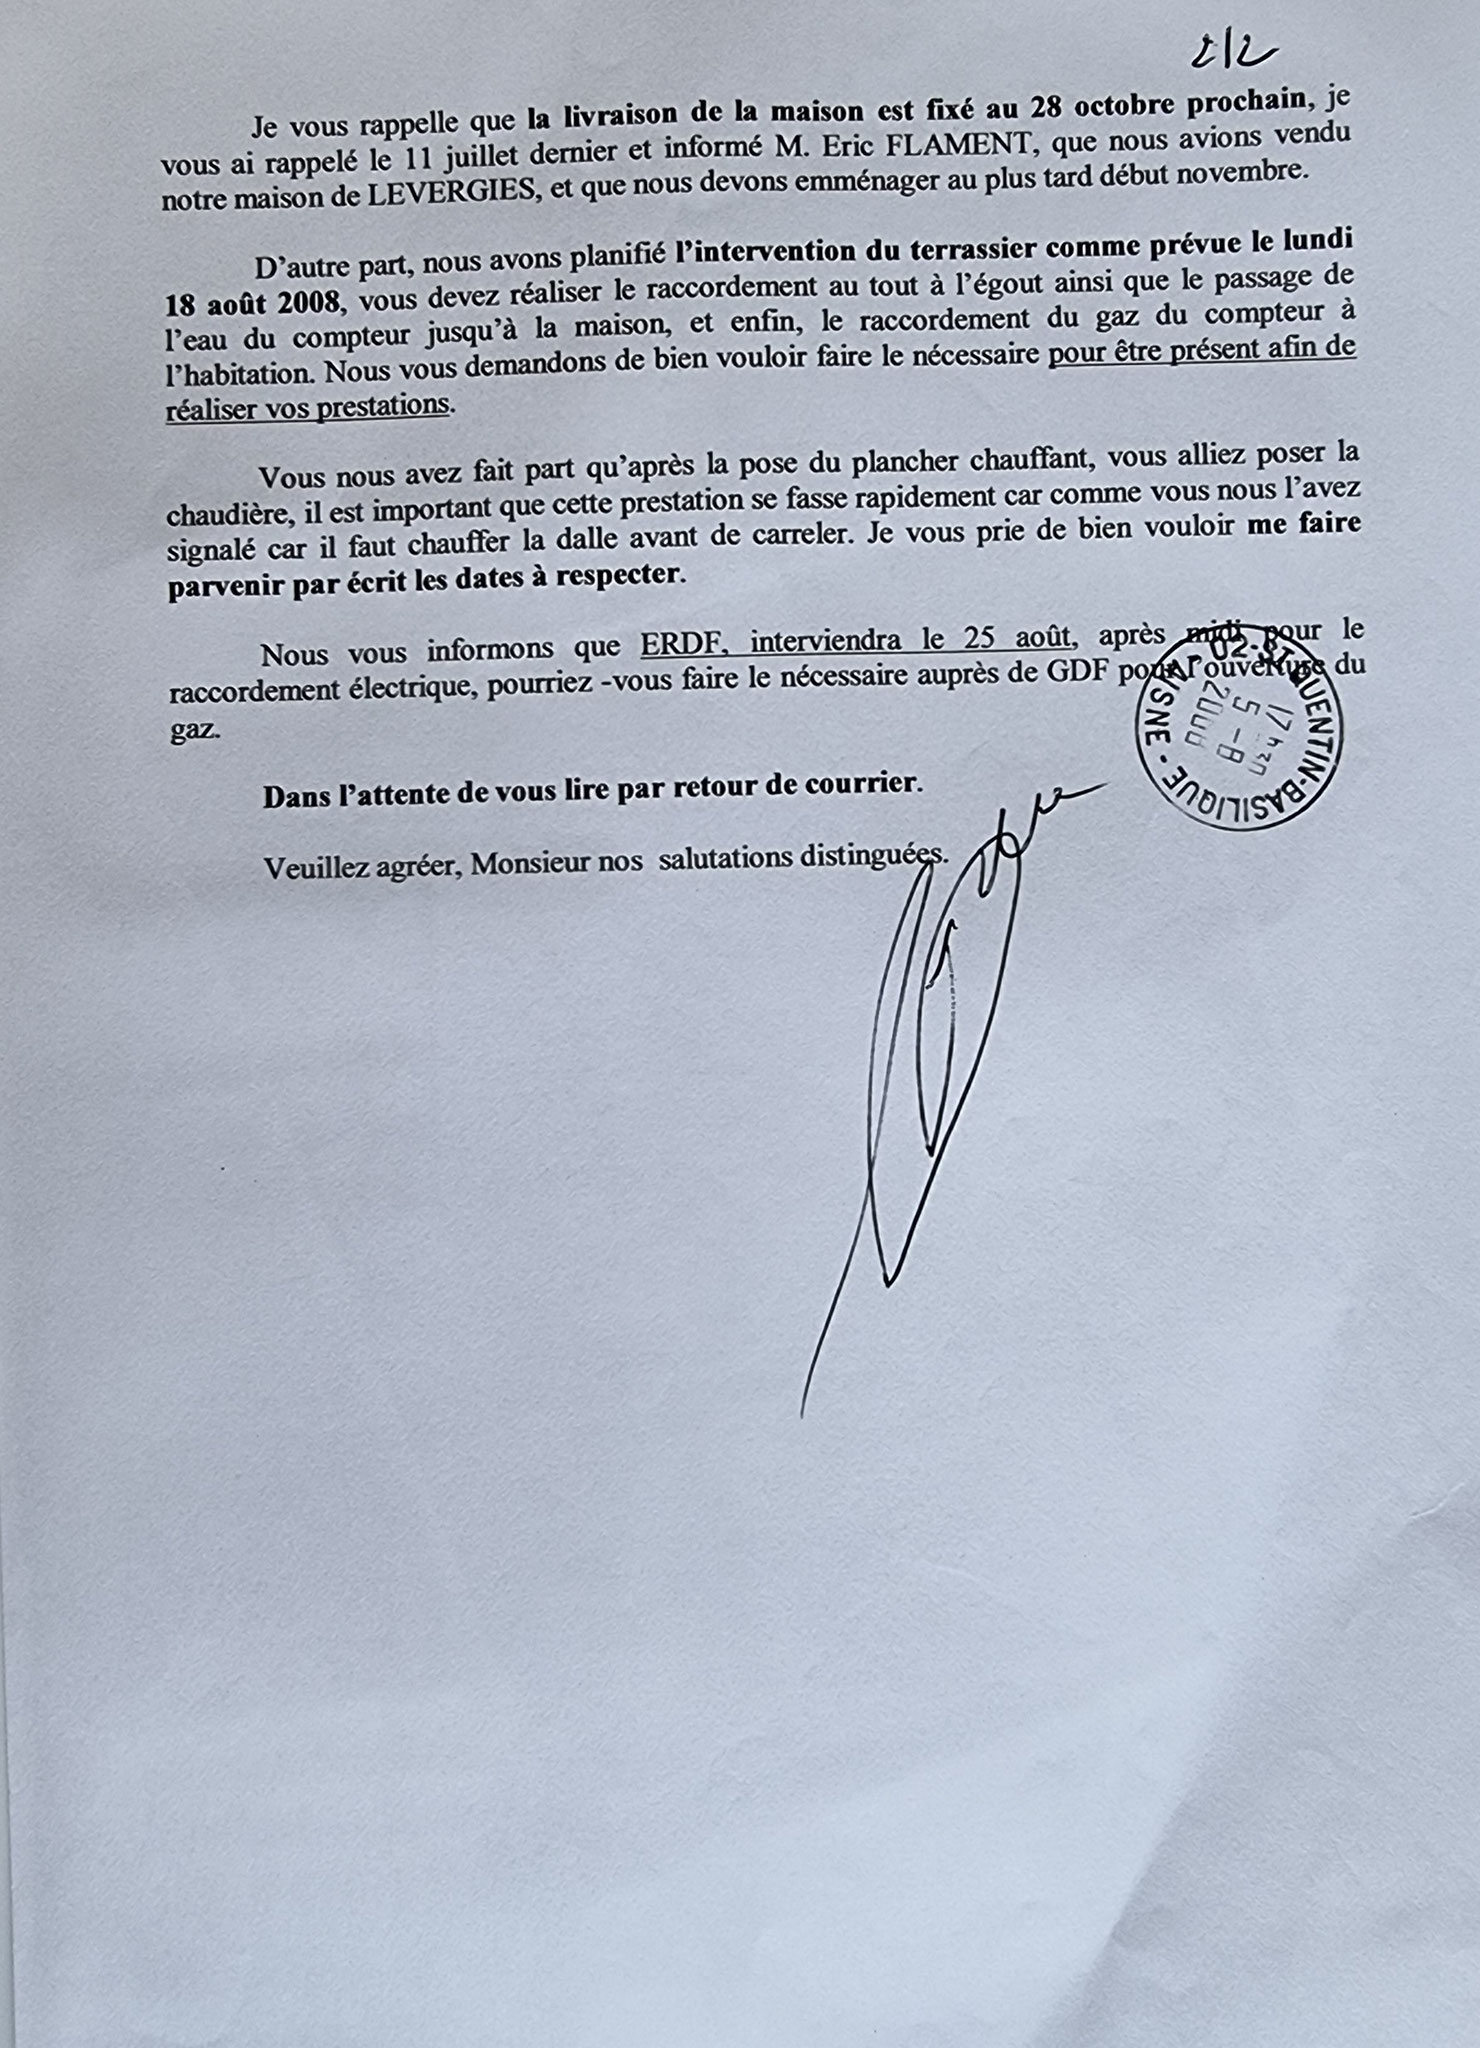 SCANDALE EXPERTISES JUDICIAIRES EN BANDE ORGANISEE, MAFIEUSE, VERREUSE...     Le 05 Juillet 2008 j'adresse une LRAR à Monsieur Alain ALLIOT.     INACCEPTABLE  BORDERLINE      EXPERTISES JUDICIAIRES ENTRE COPAINS... www.jesuispatrick.fr www.jesuisvictime.f